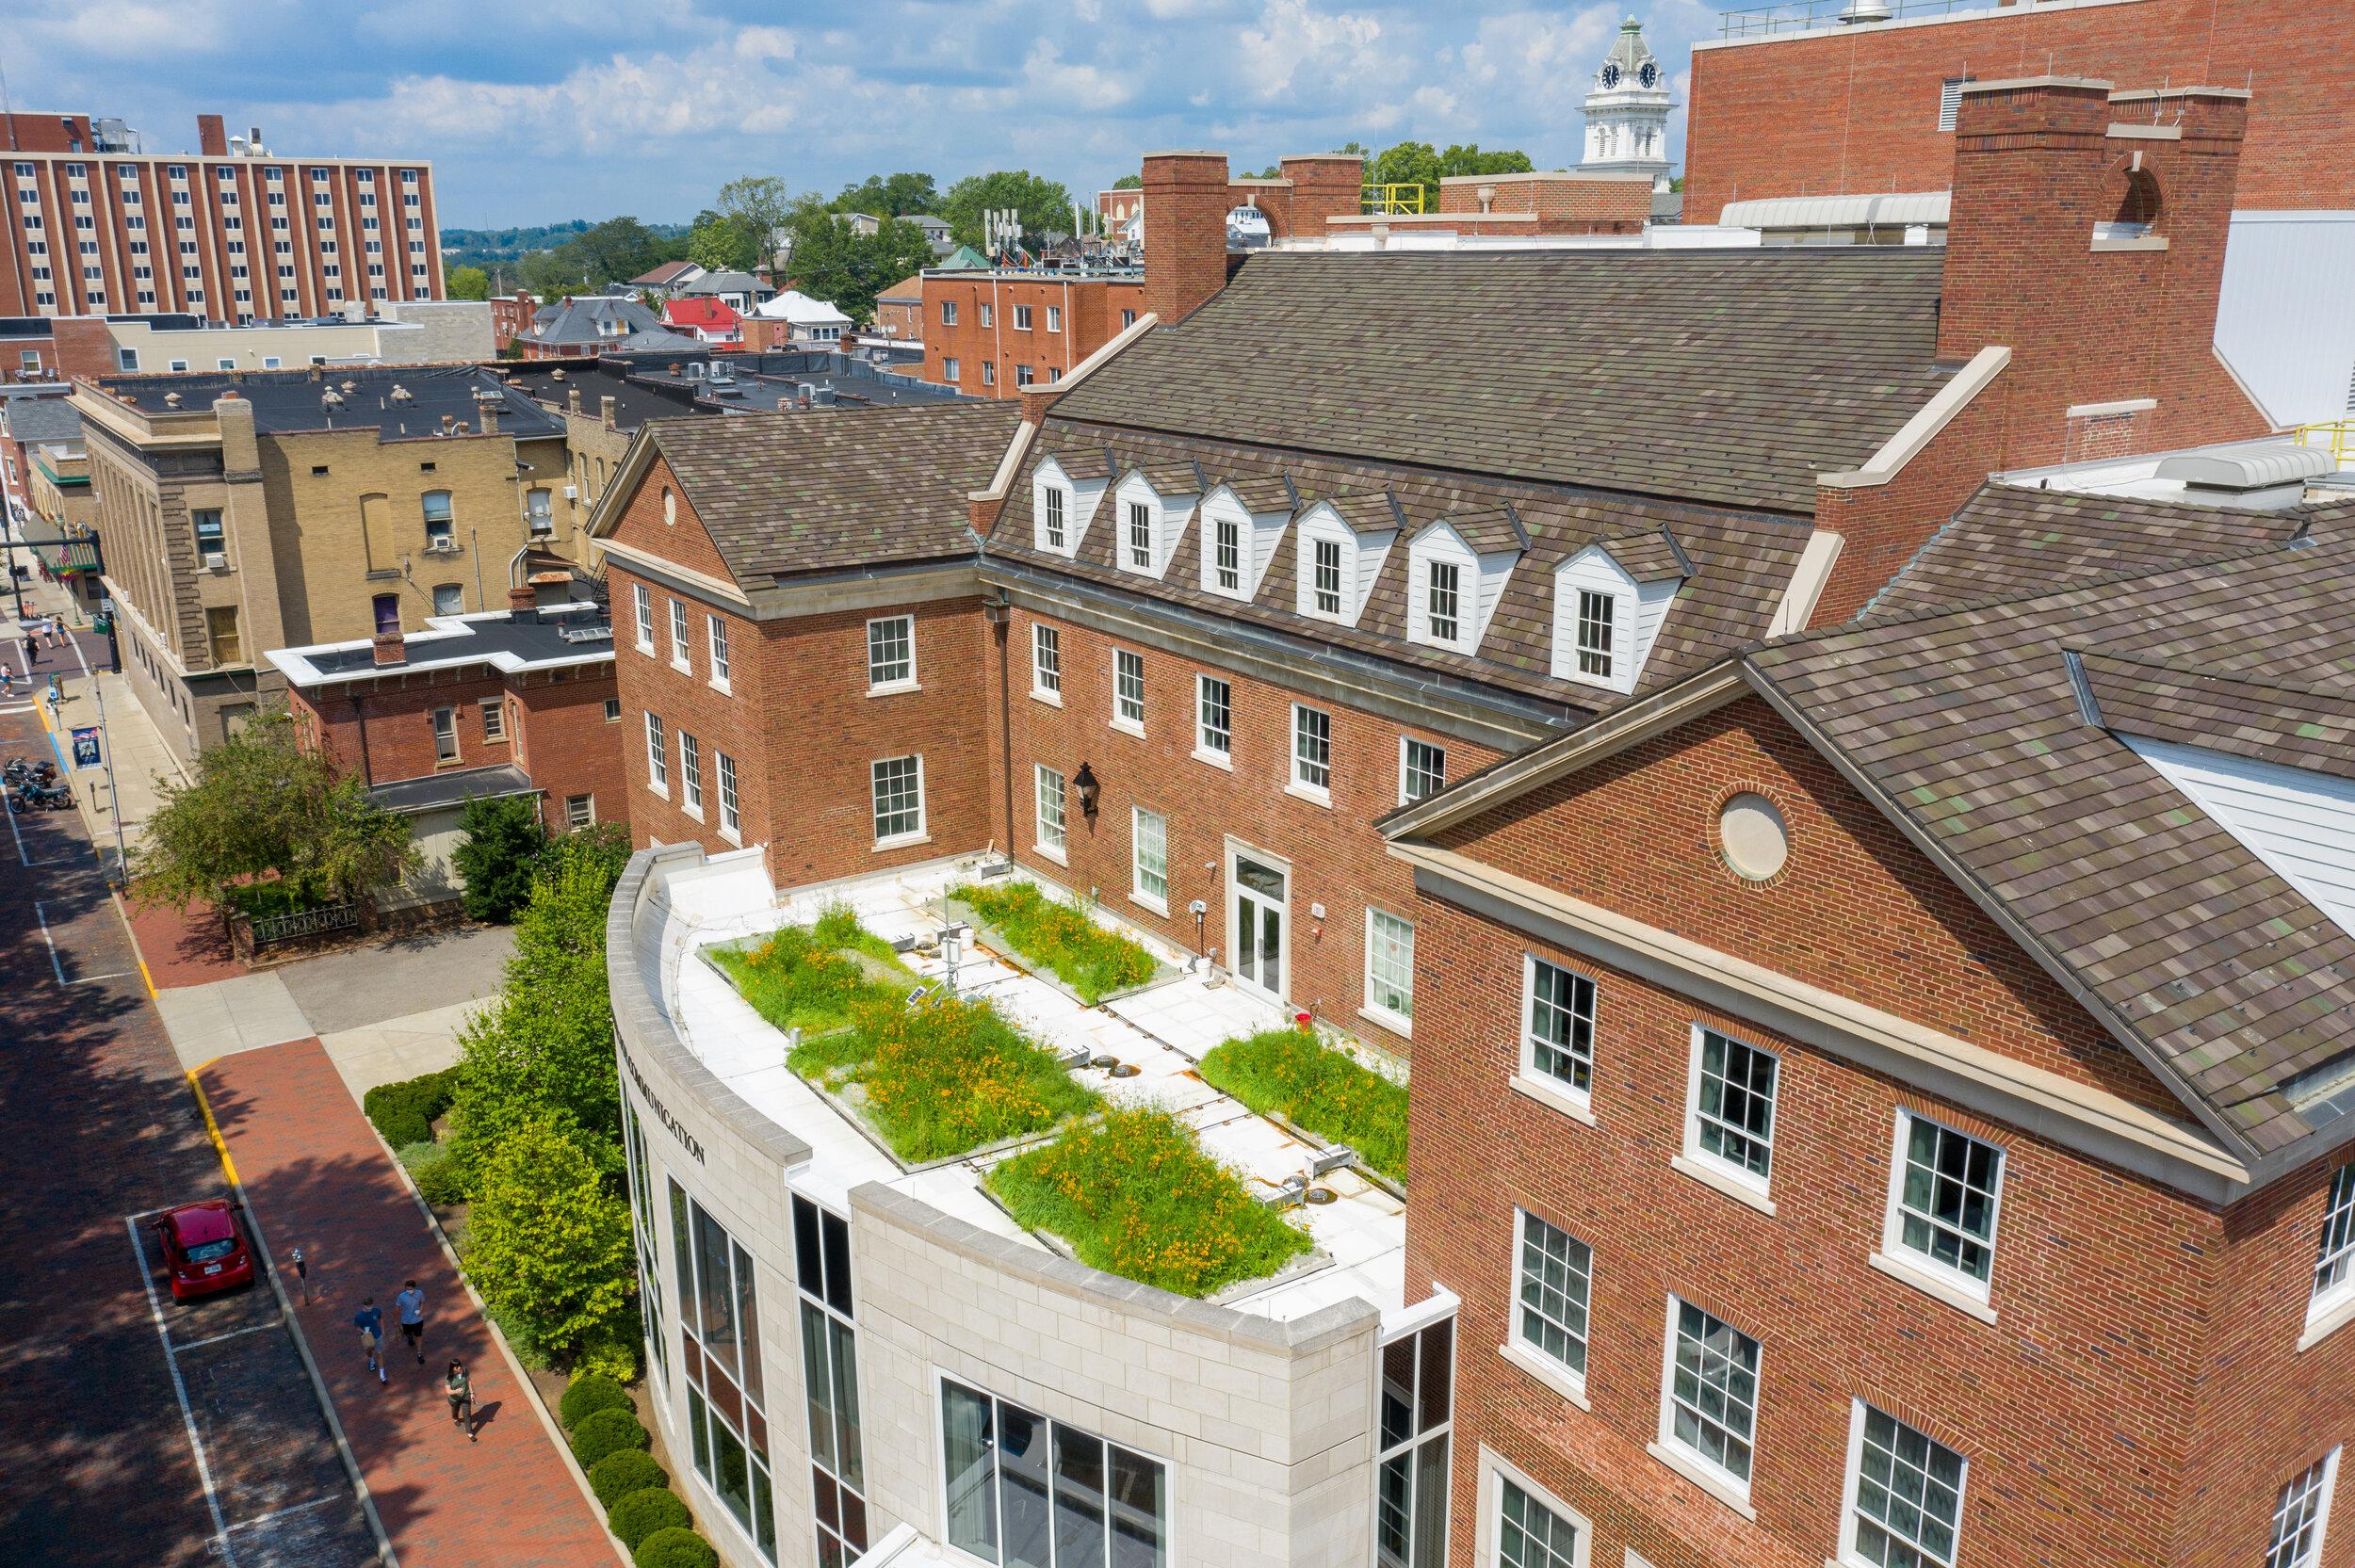 Schoonover中心,俄亥俄大学,雅典俄亥俄。2020年7月(图片:本·西格尔)